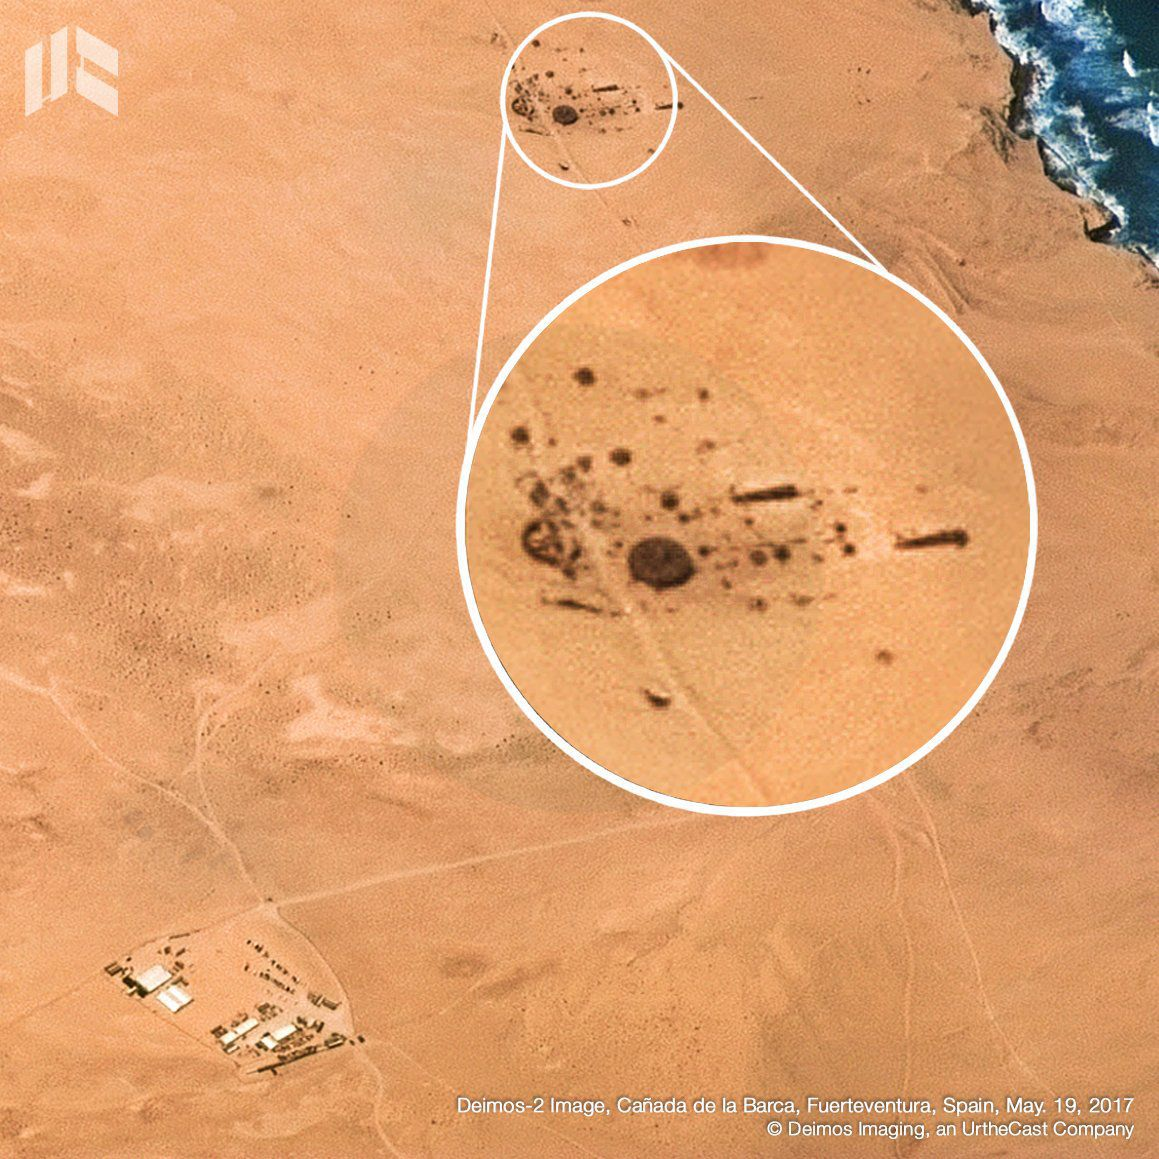 http://www.starwars-universe.com/images/actualites/spinoff/fuerteventura/07.jpg